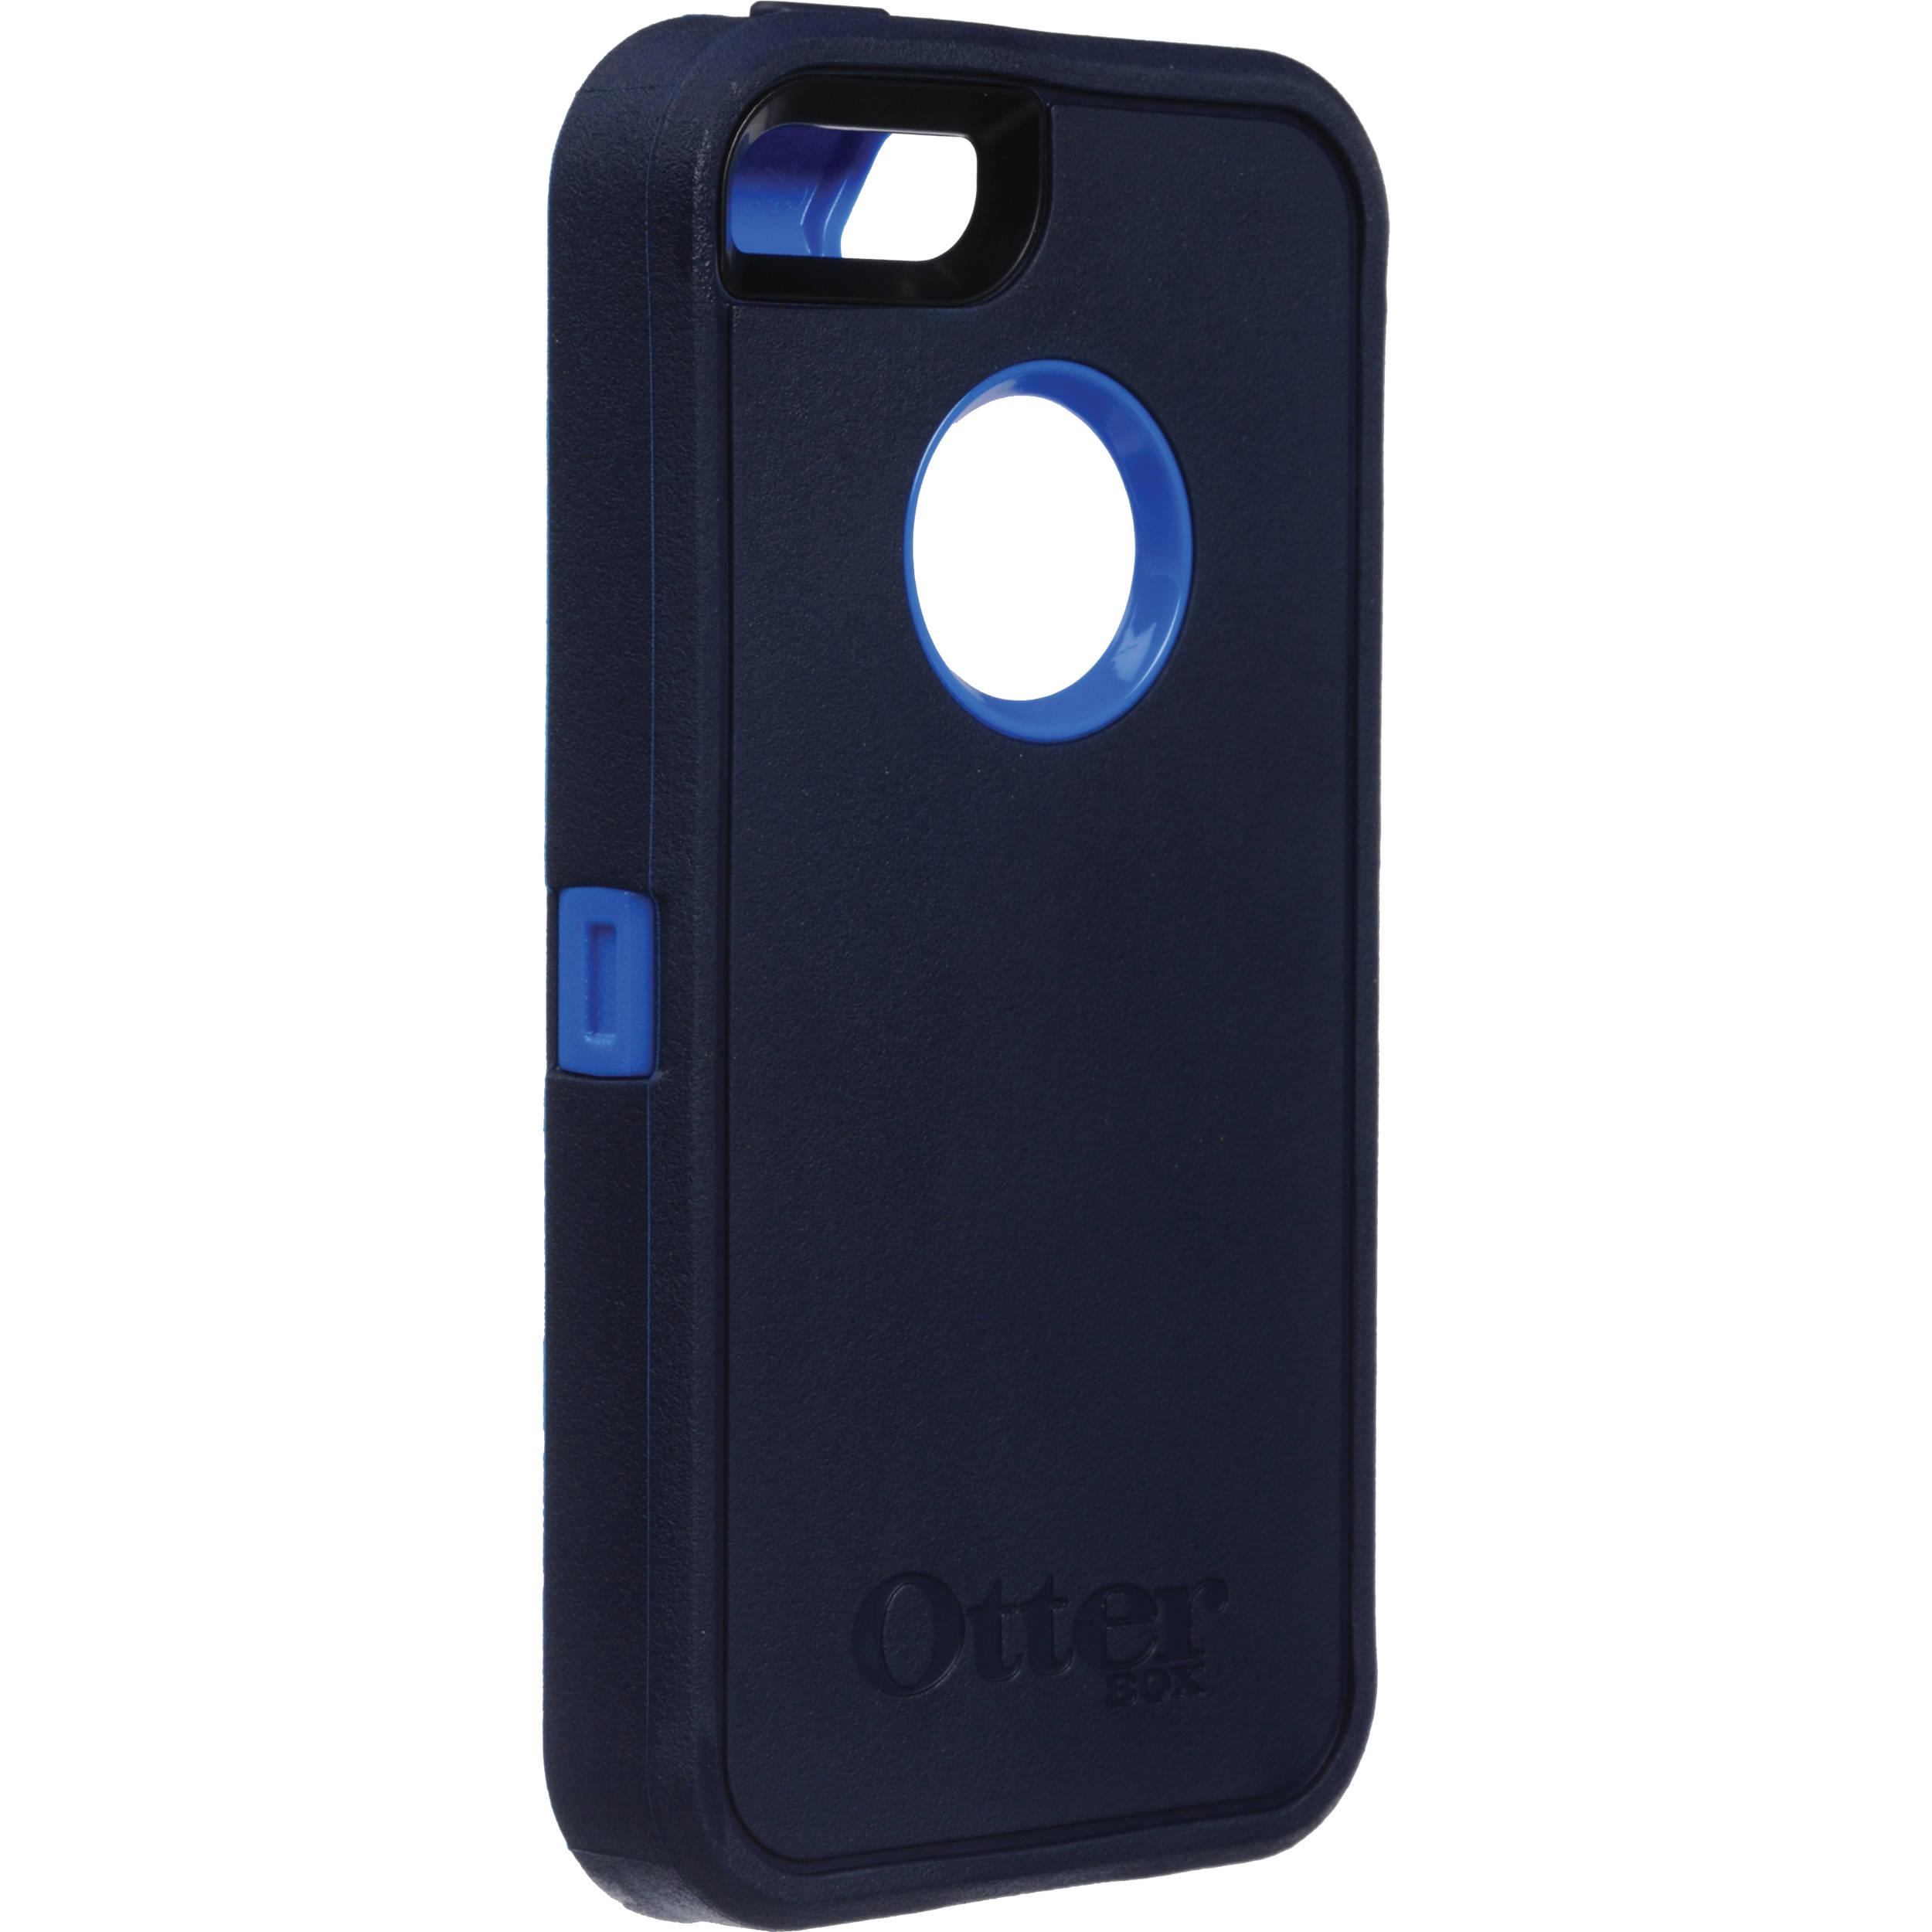 huge discount c81df 9010f OtterBox Defender Series Case for iPhone 5/5s/SE (Surf)